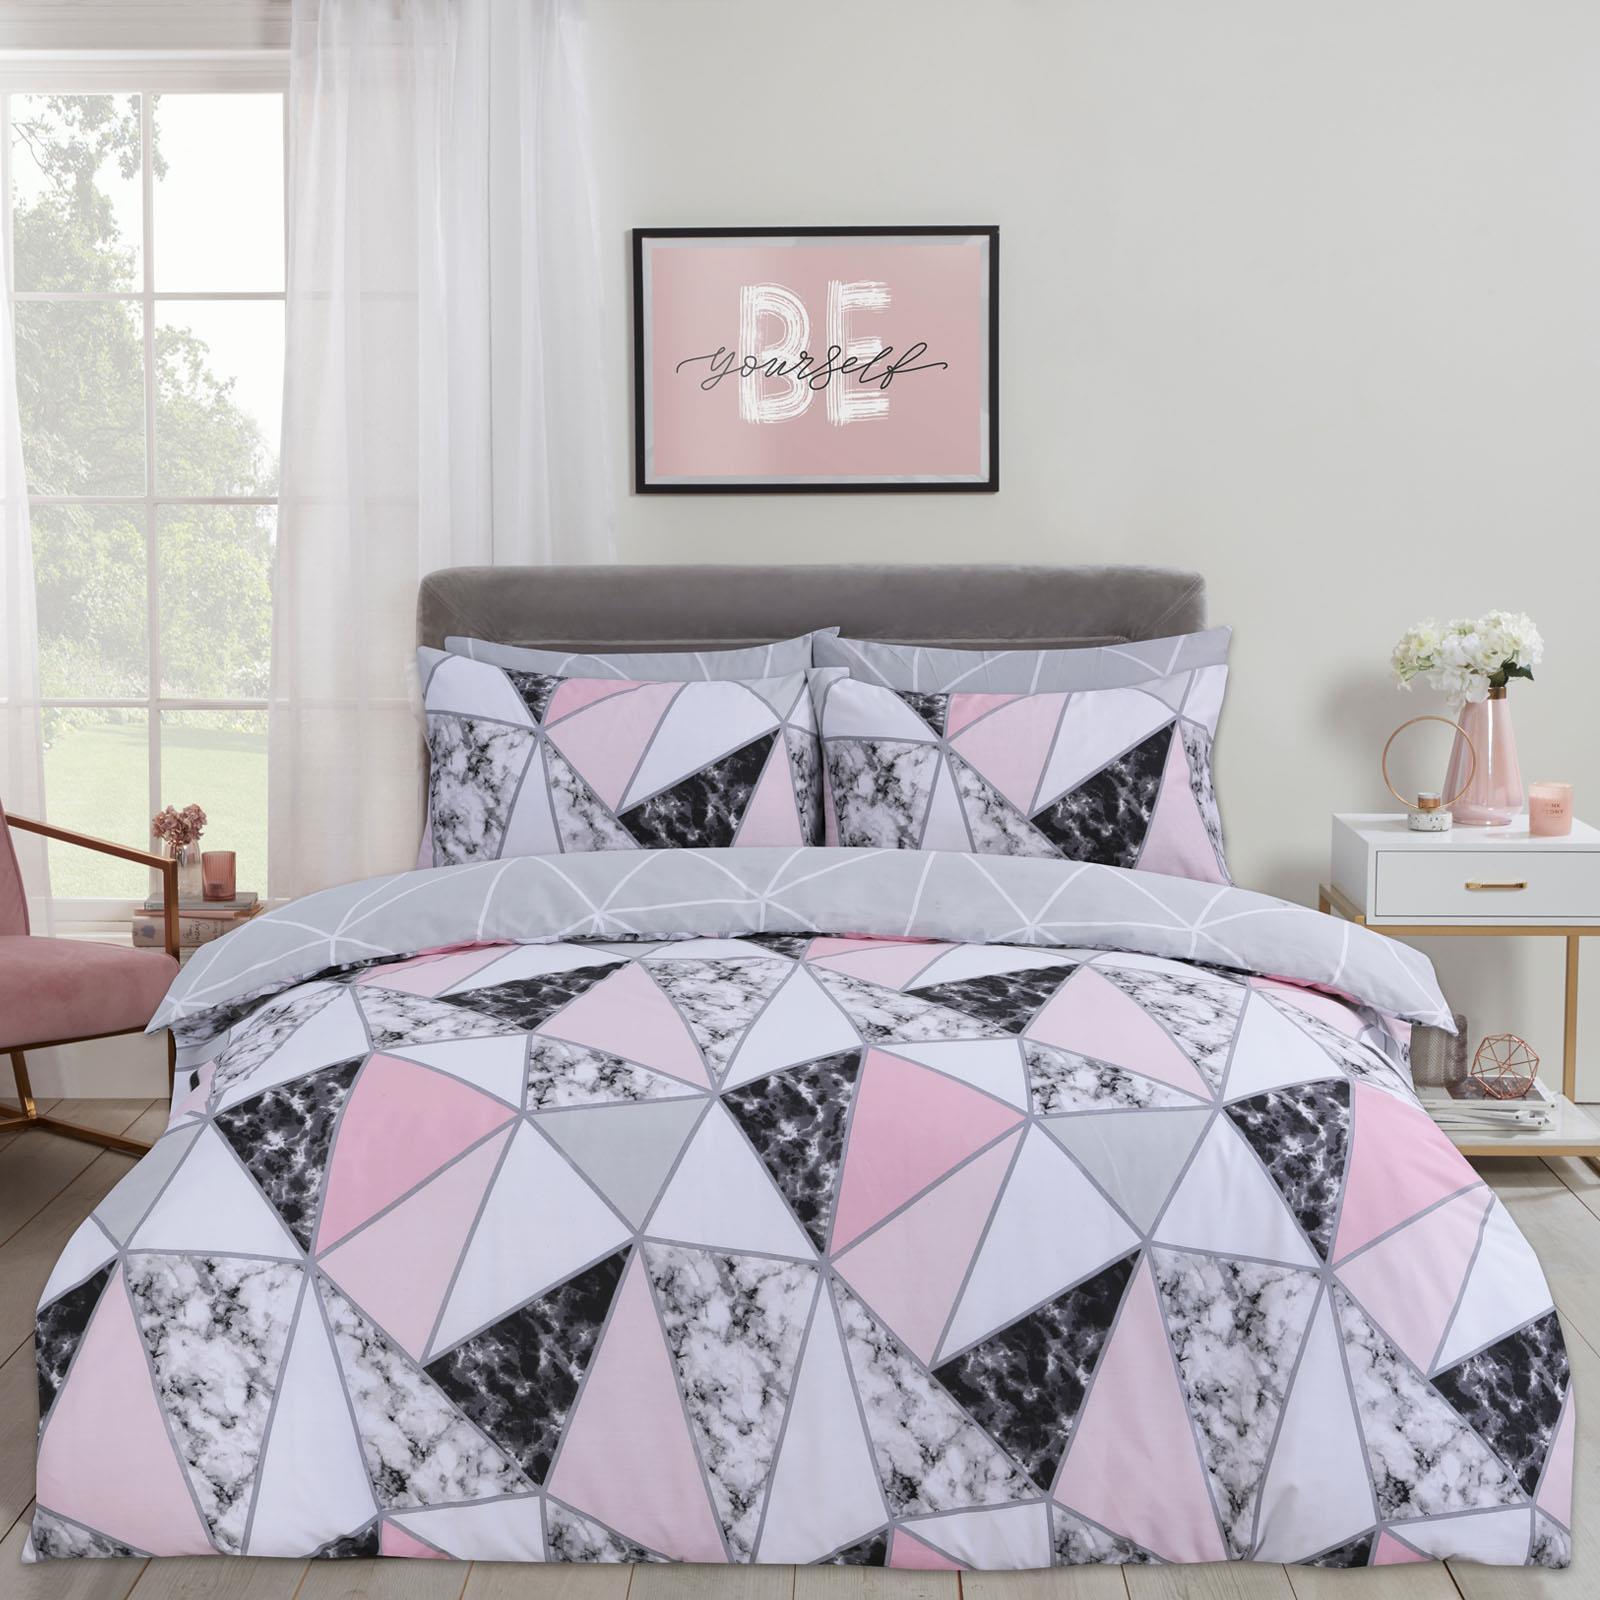 thumbnail 6 - Dreamscene Marble Geometric Duvet Cover with Pillowcase Bedding Set Grey Blush